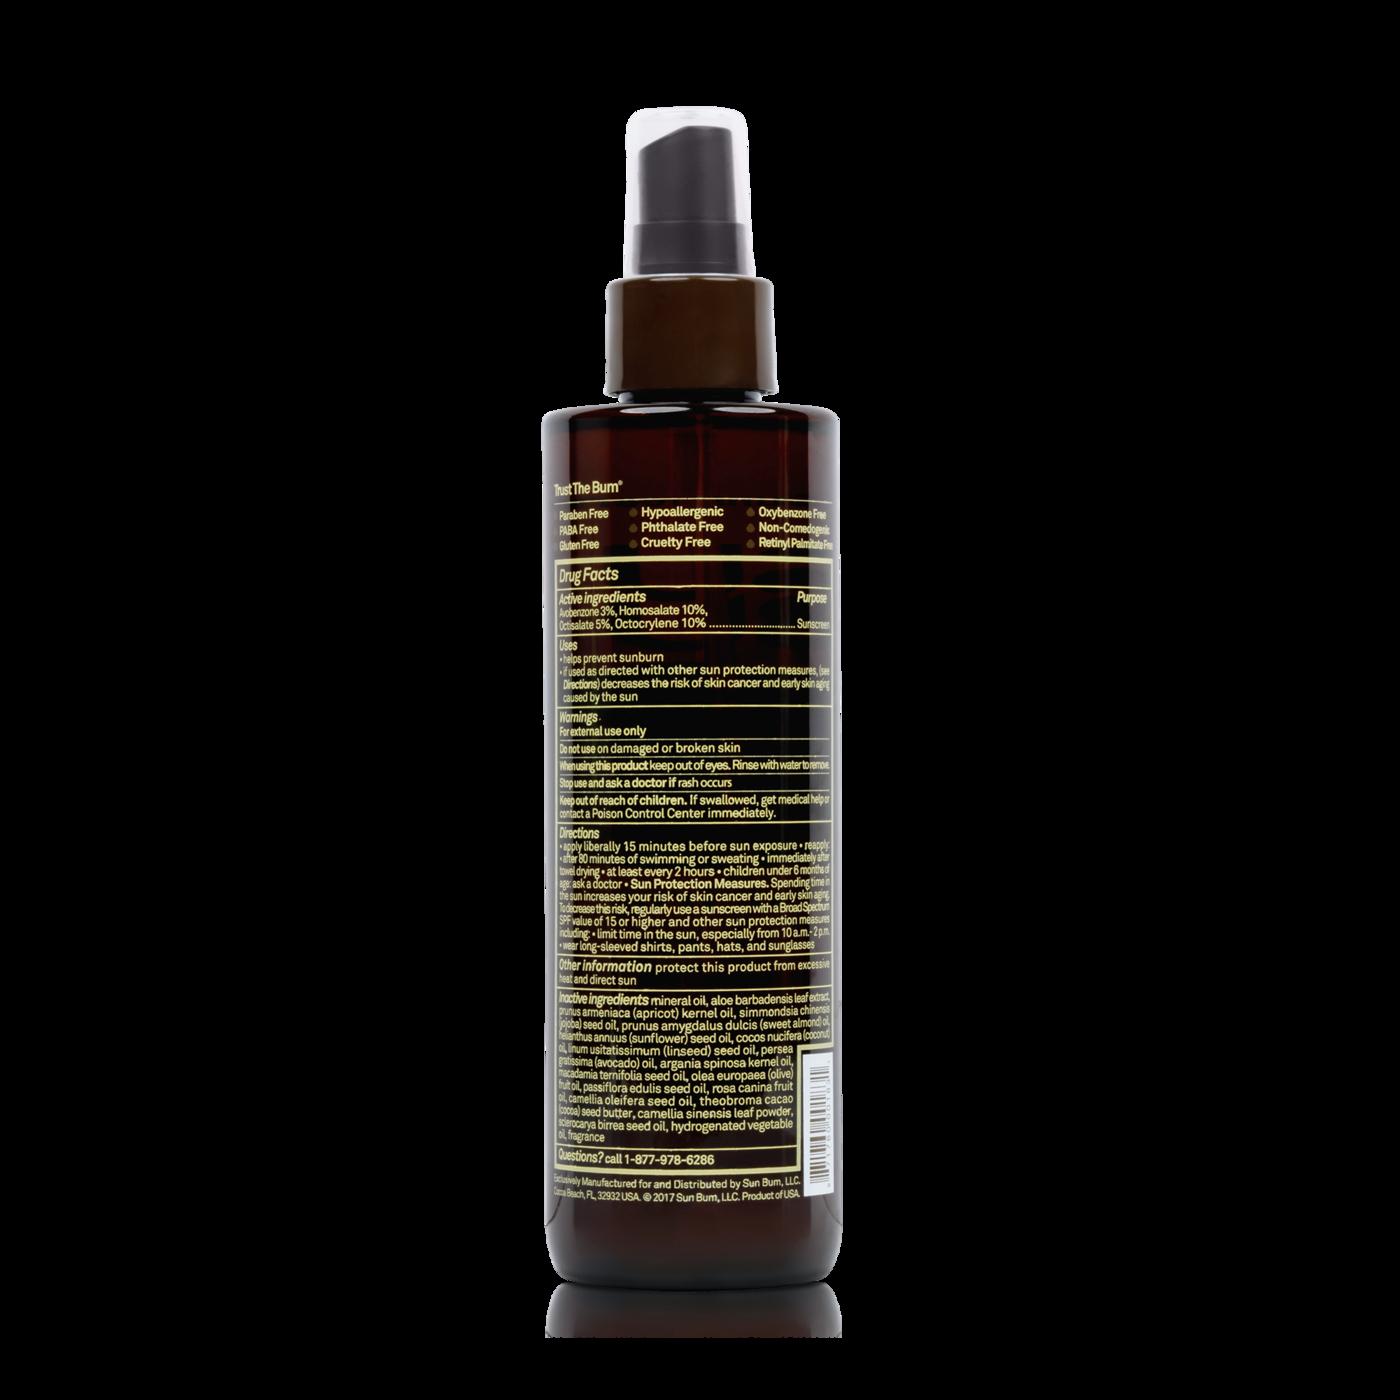 SUN BUM Sun Bum SPF 15 Sunscreen Tanning Oil